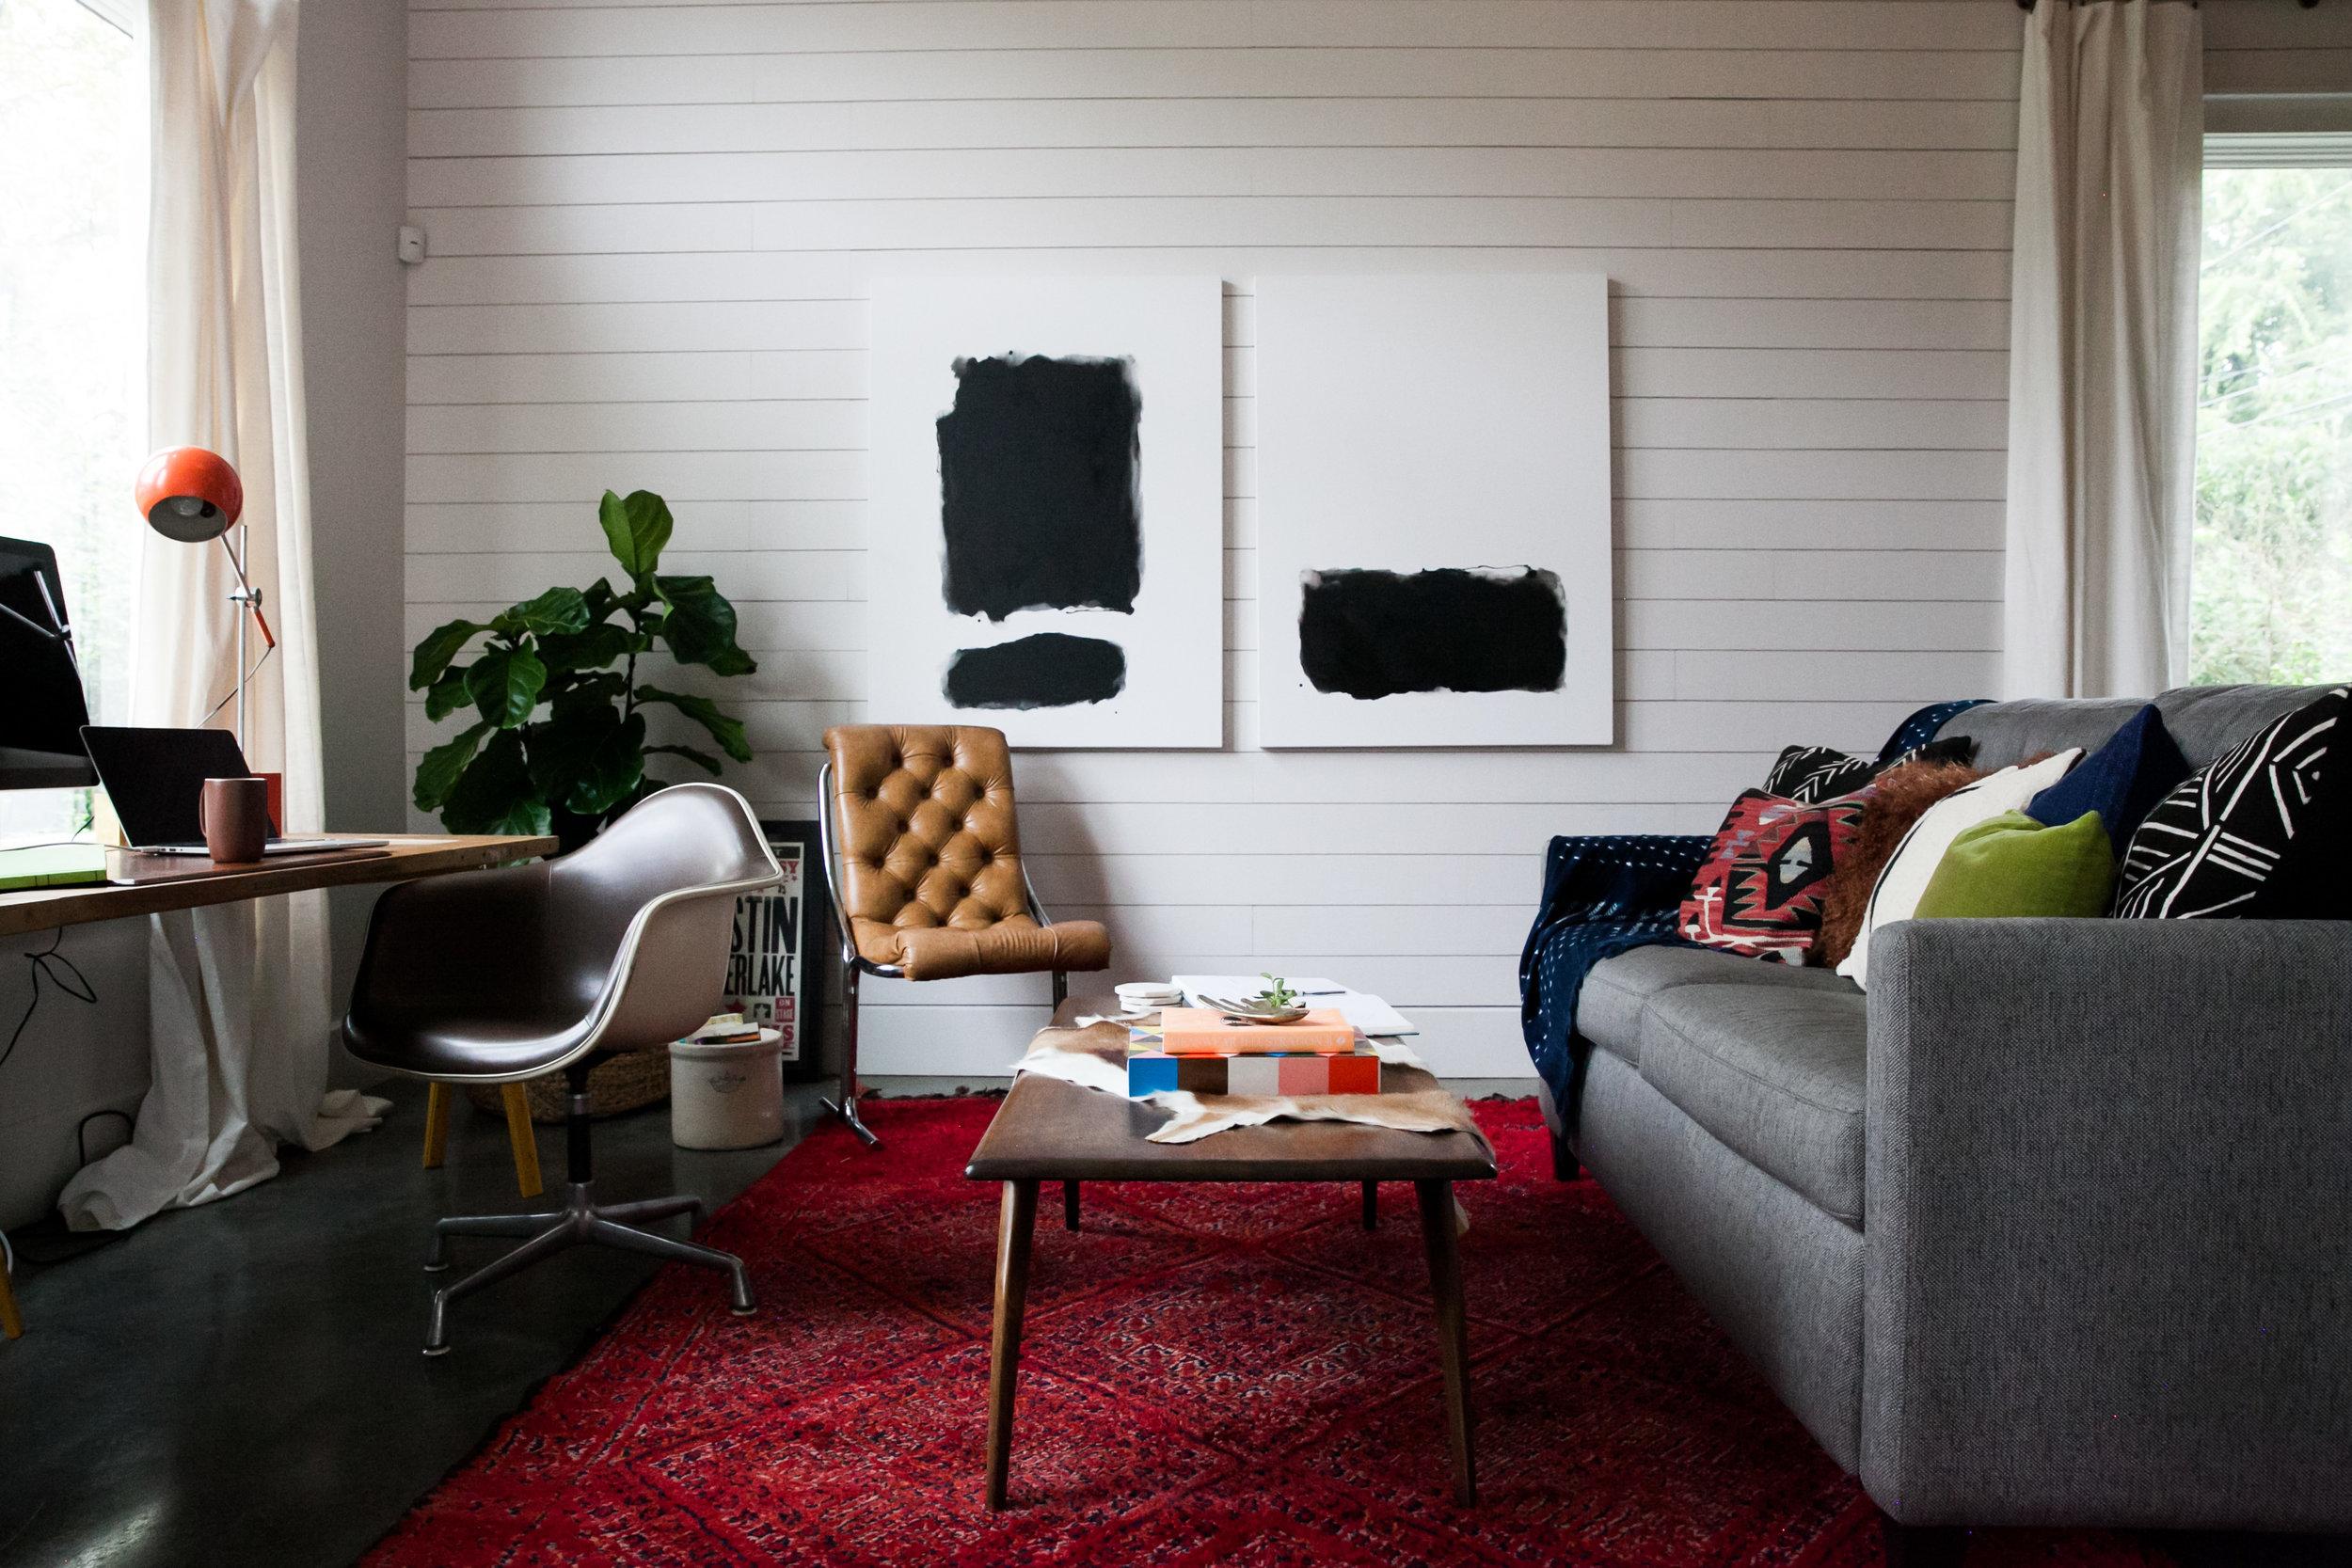 LisaDiederichPhotography_MattHomeTour_ApartmentTherapy-3.jpg